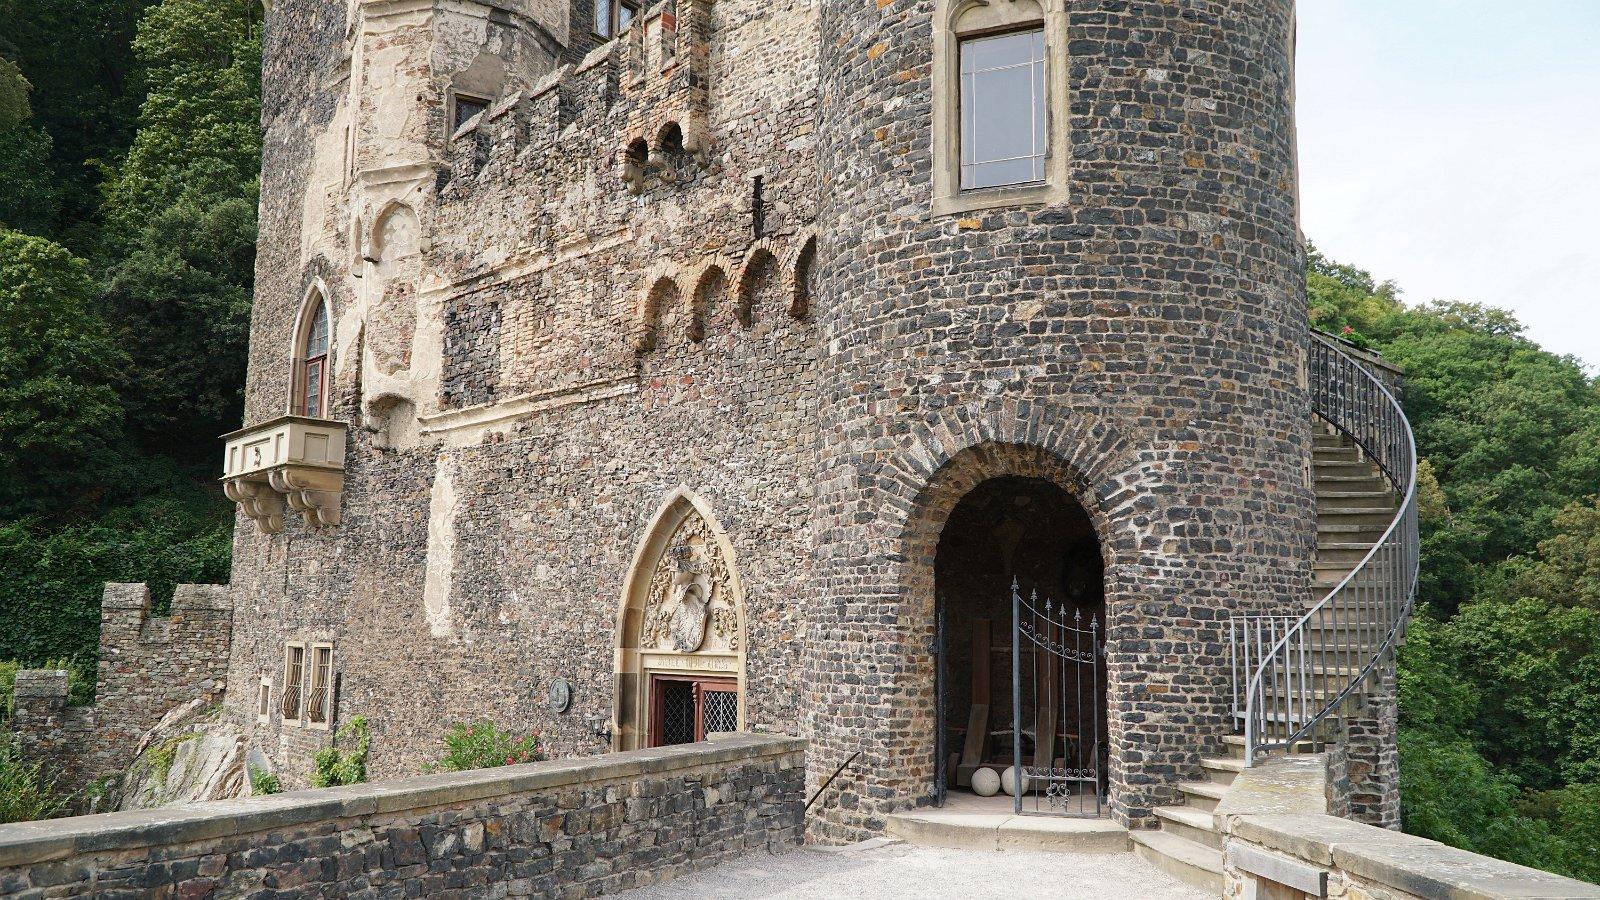 Visiting Rheinstein Castle on the Rhine River